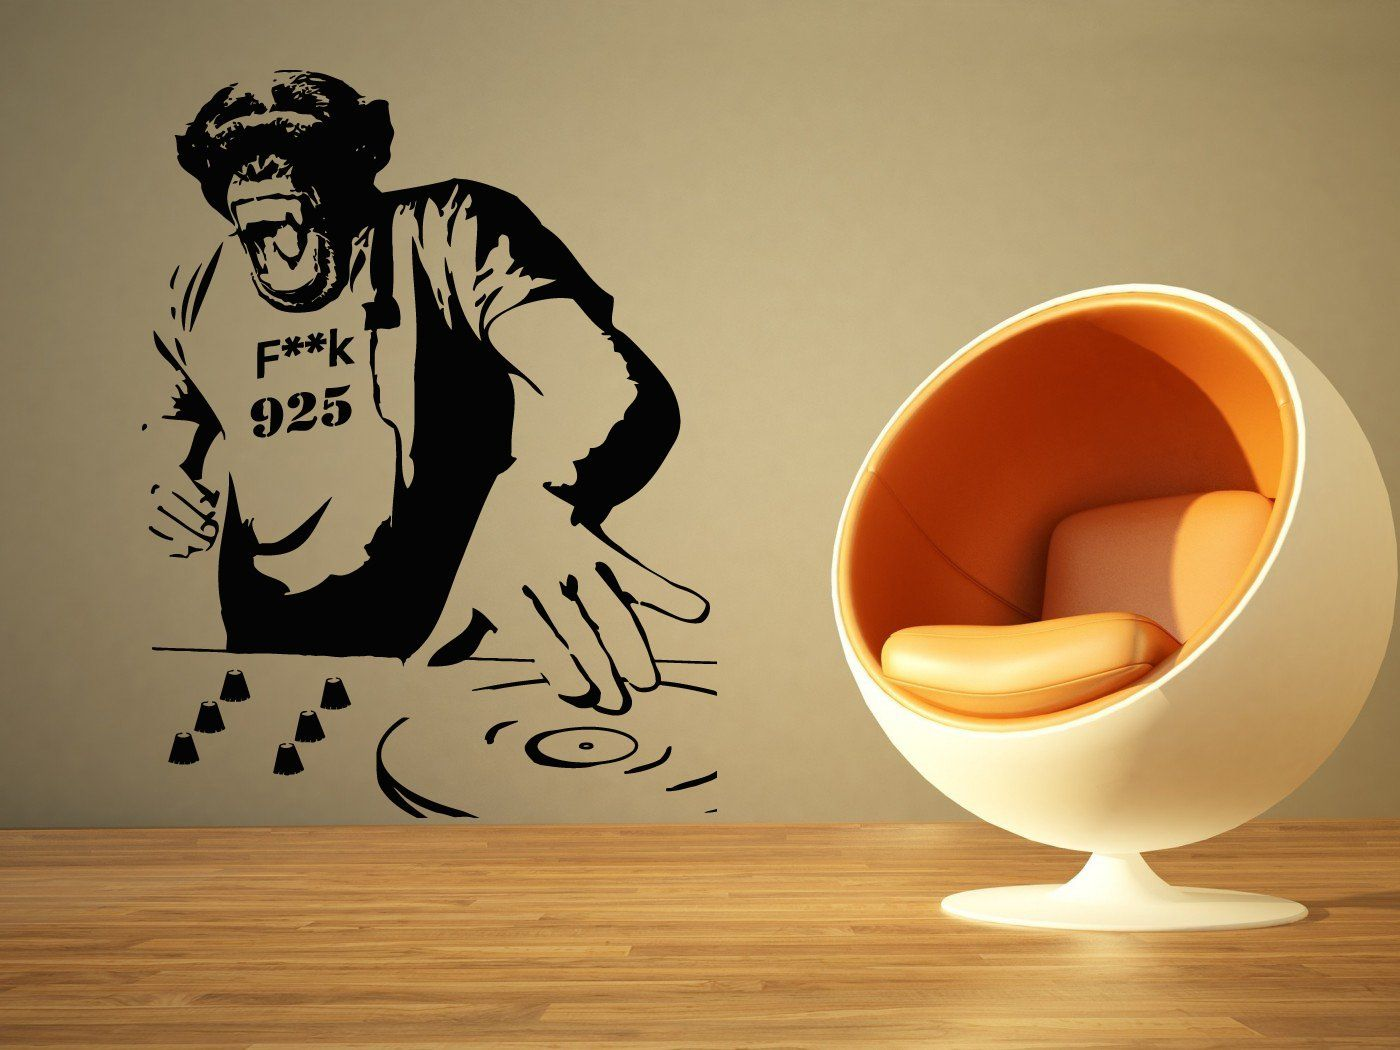 Wall Room Decor Art Vinyl Sticker Mural Decal Chimp Dj Monkey Edm ...